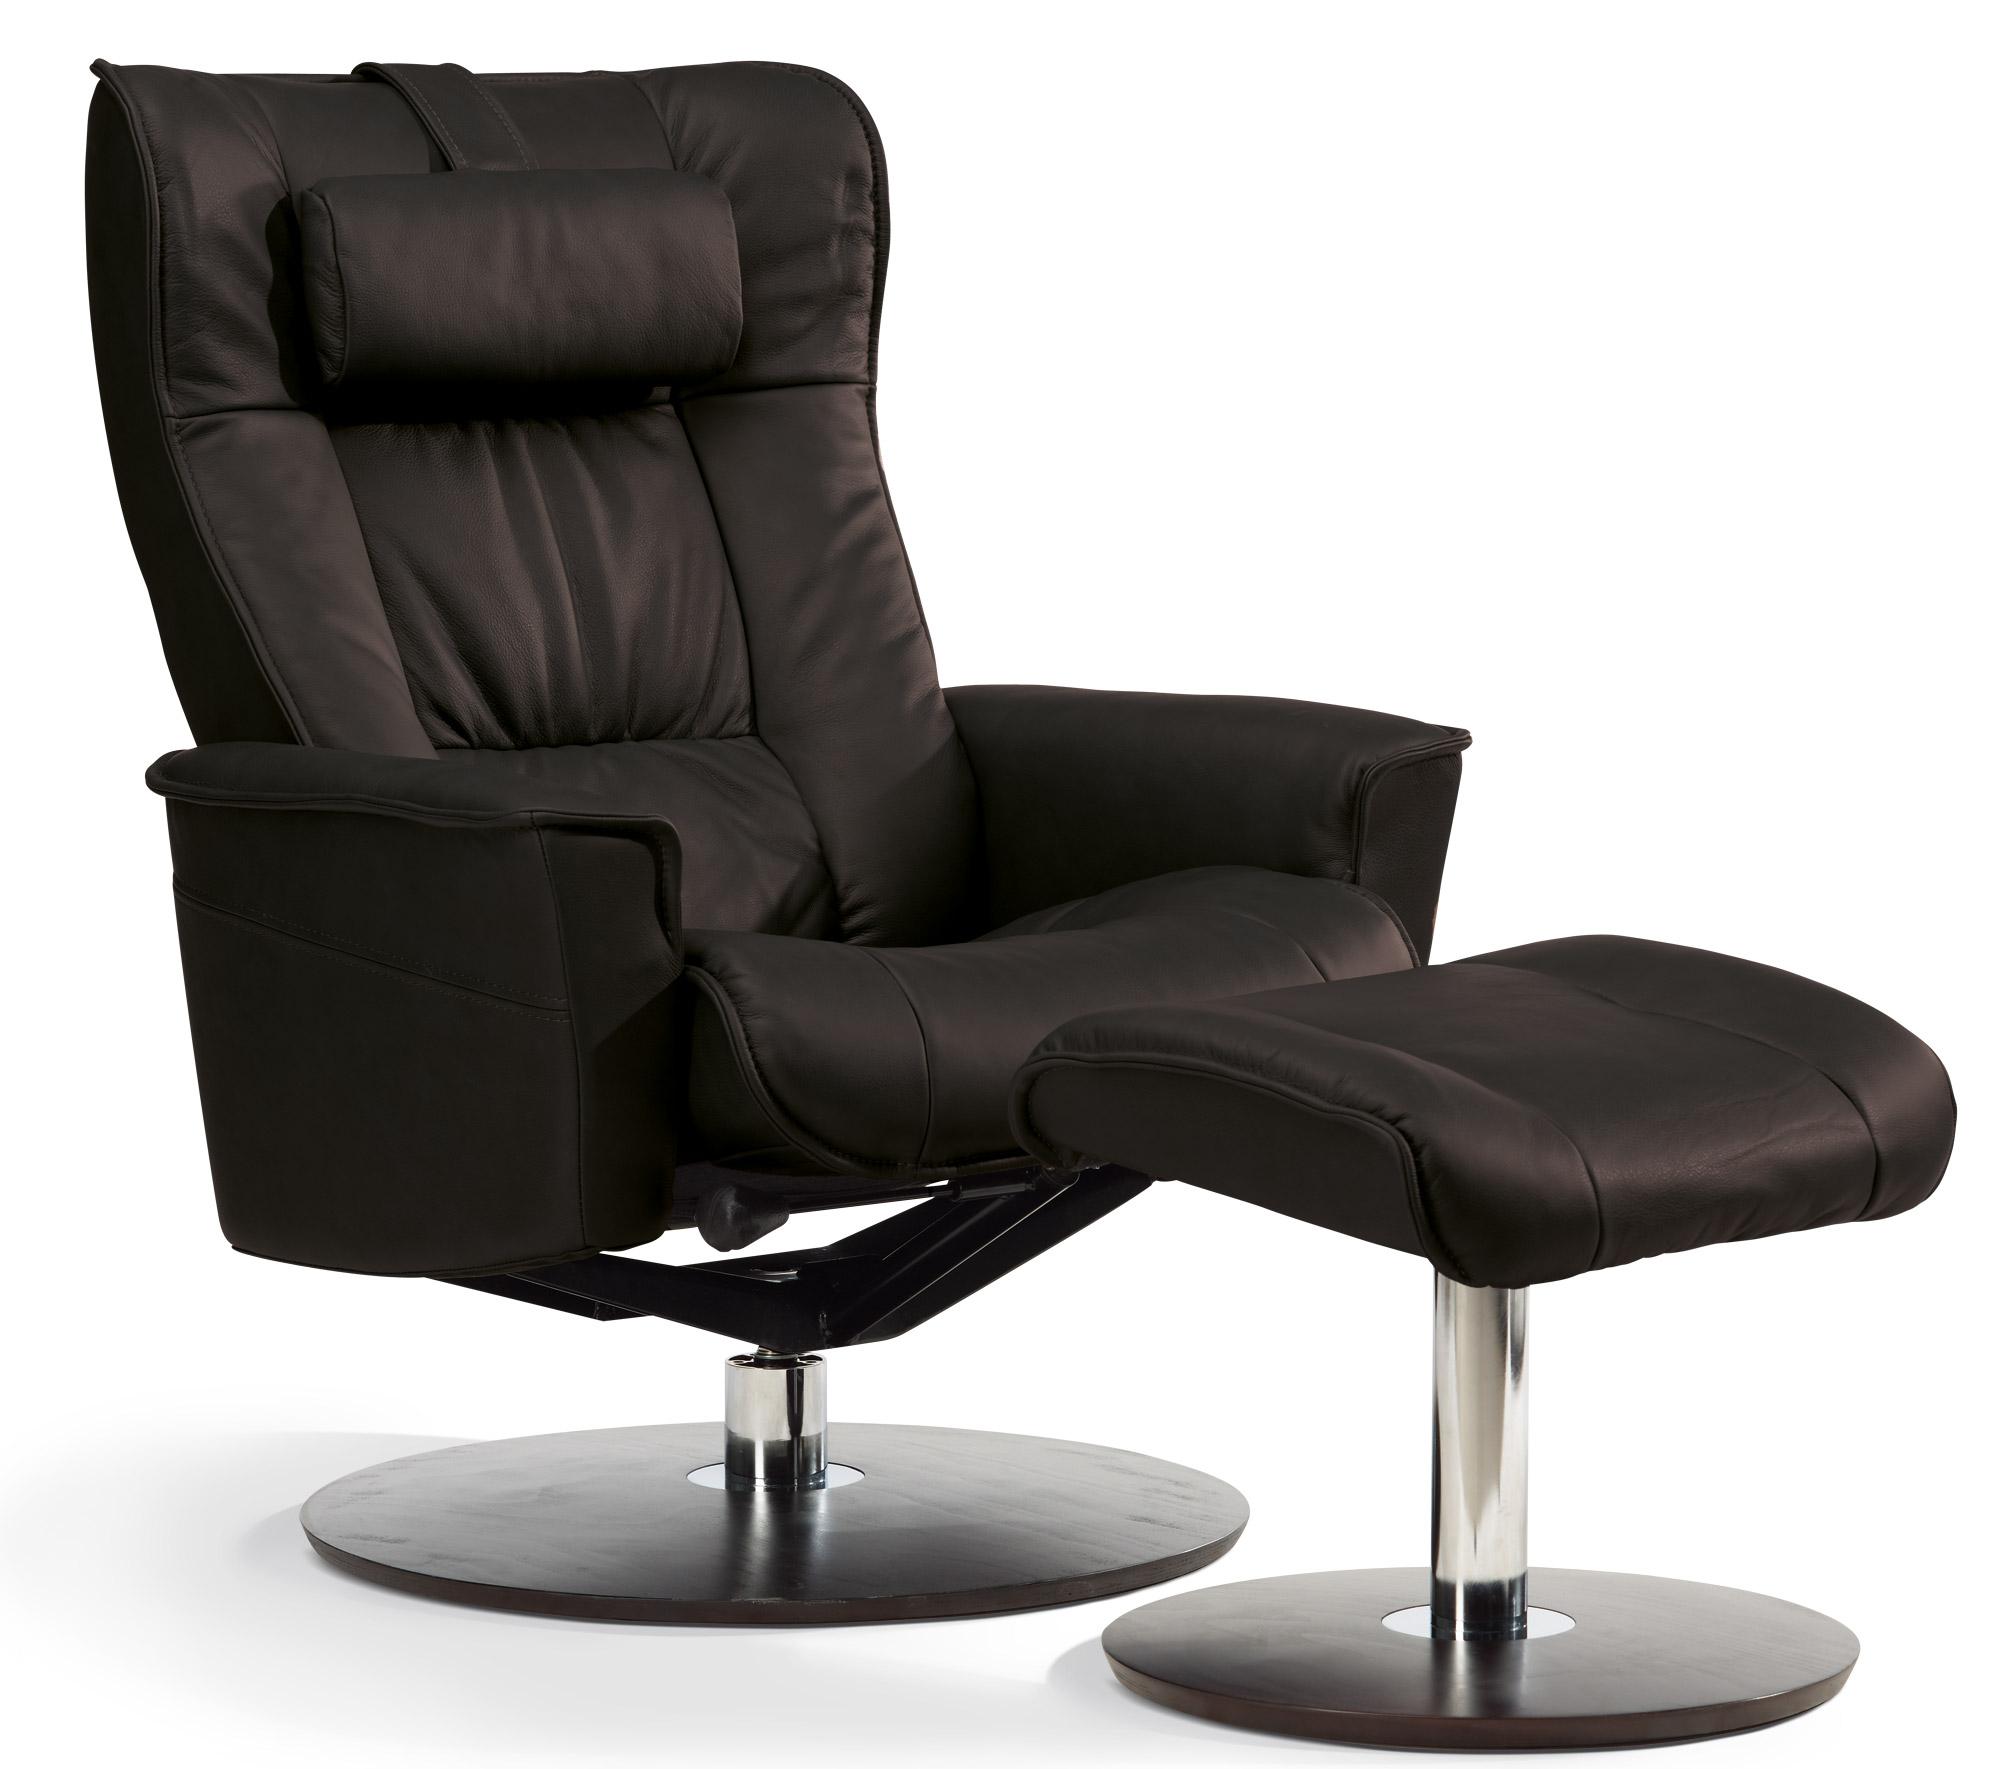 Sitwell Gernot Steifensand Relax Sessel - Der Kompakte in schwarz